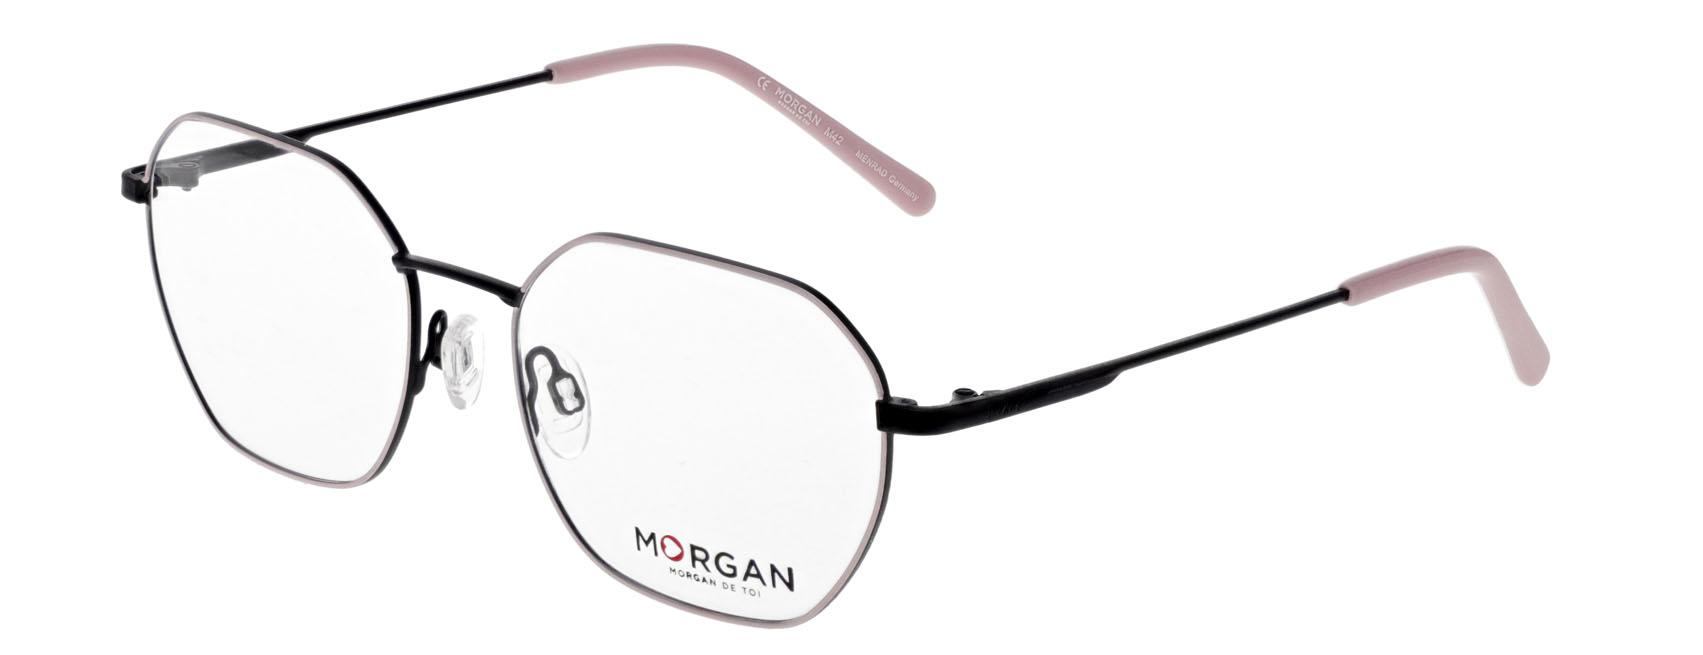 Morgan 203210 6100